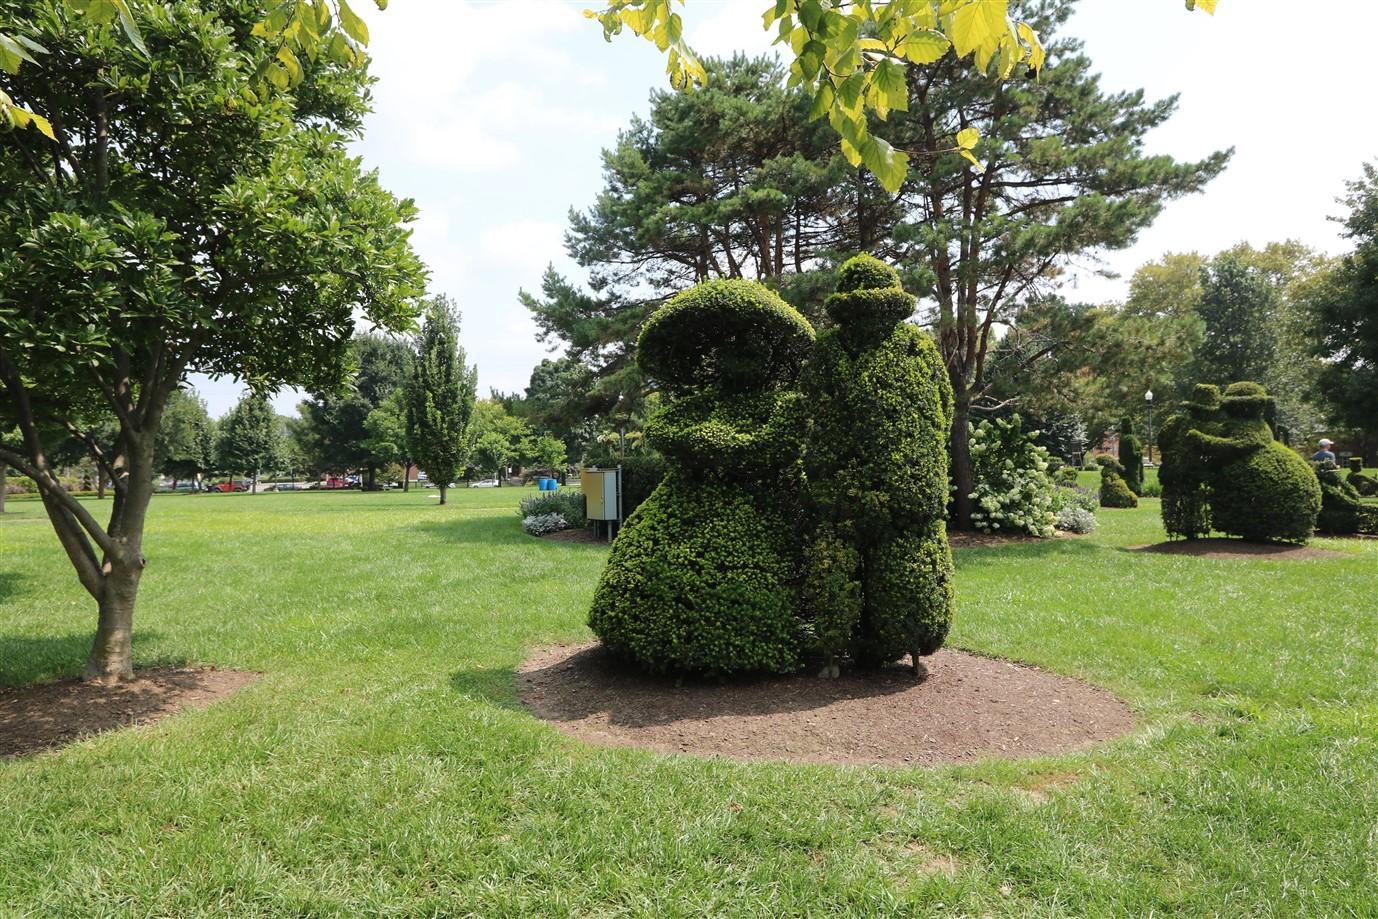 2018 08 26 102 Columbus Topiary Park.jpg